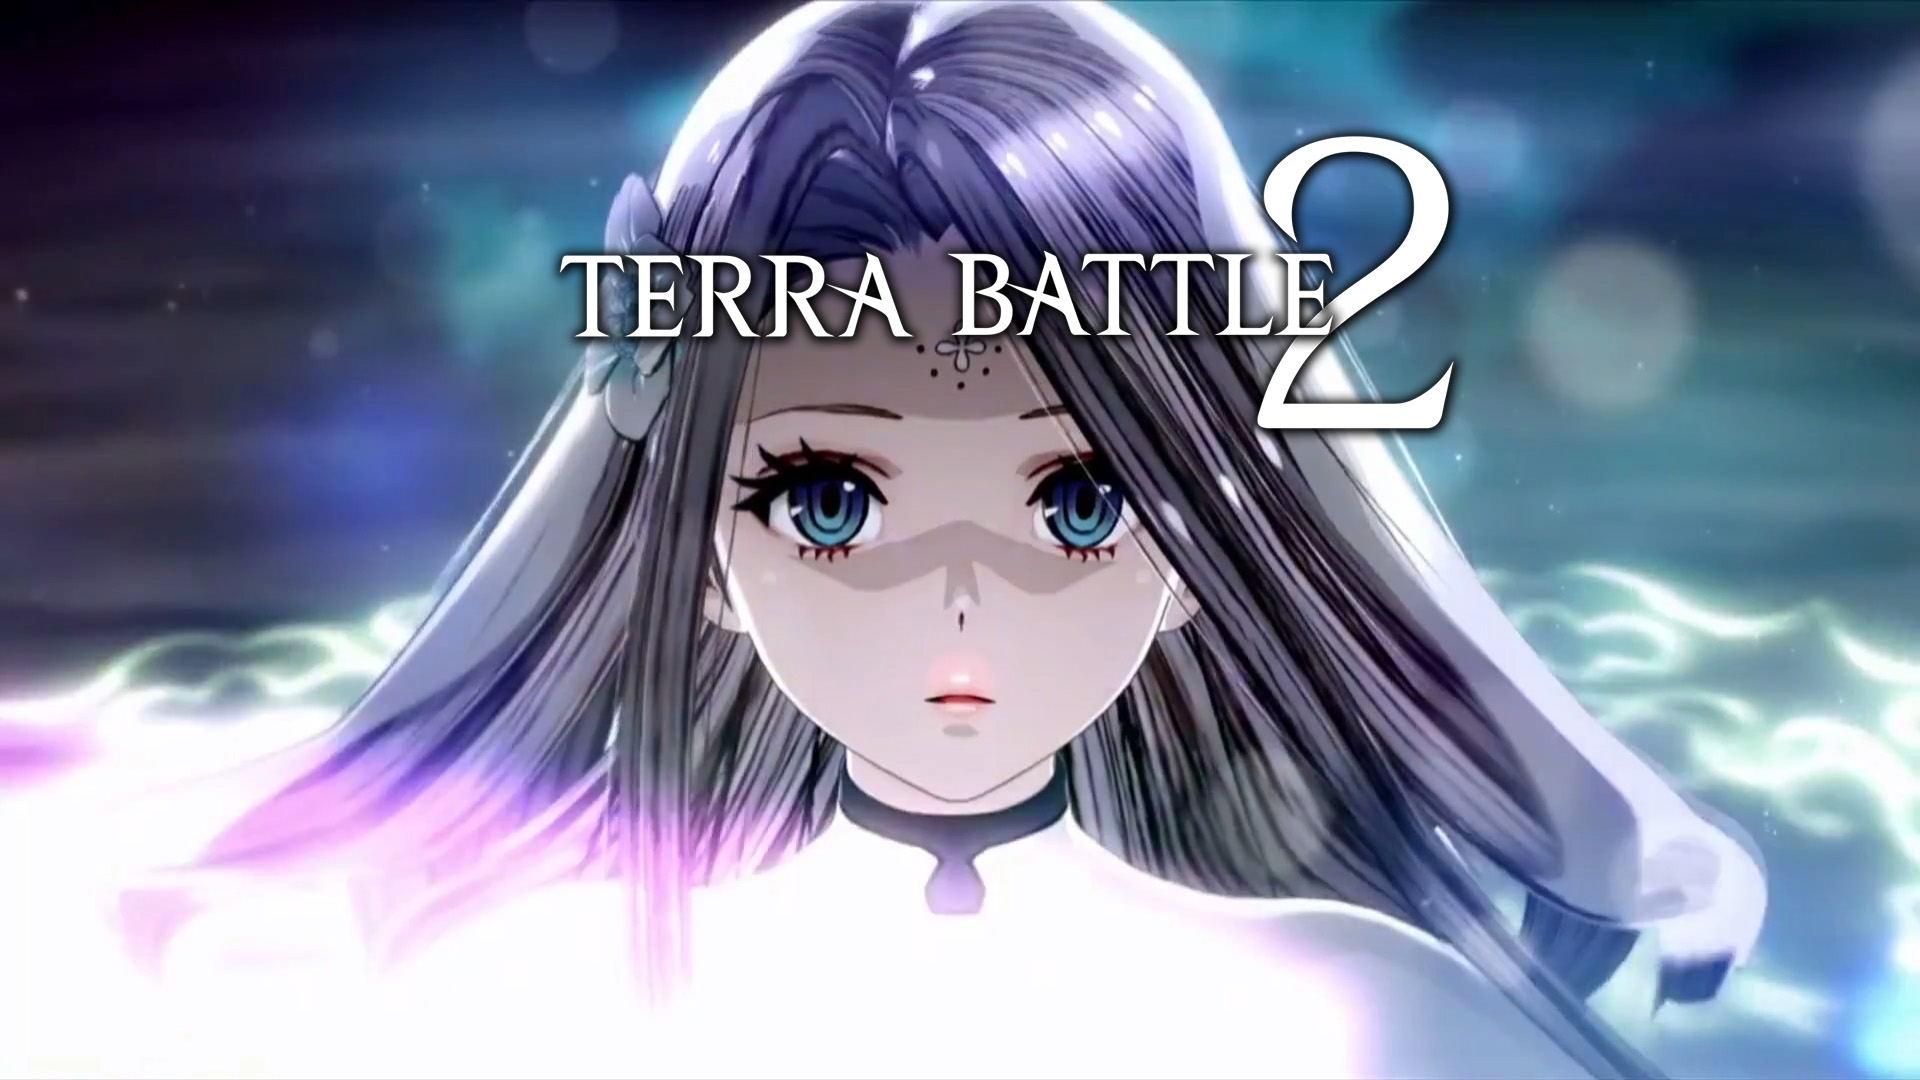 terra battle 2 22092017 01